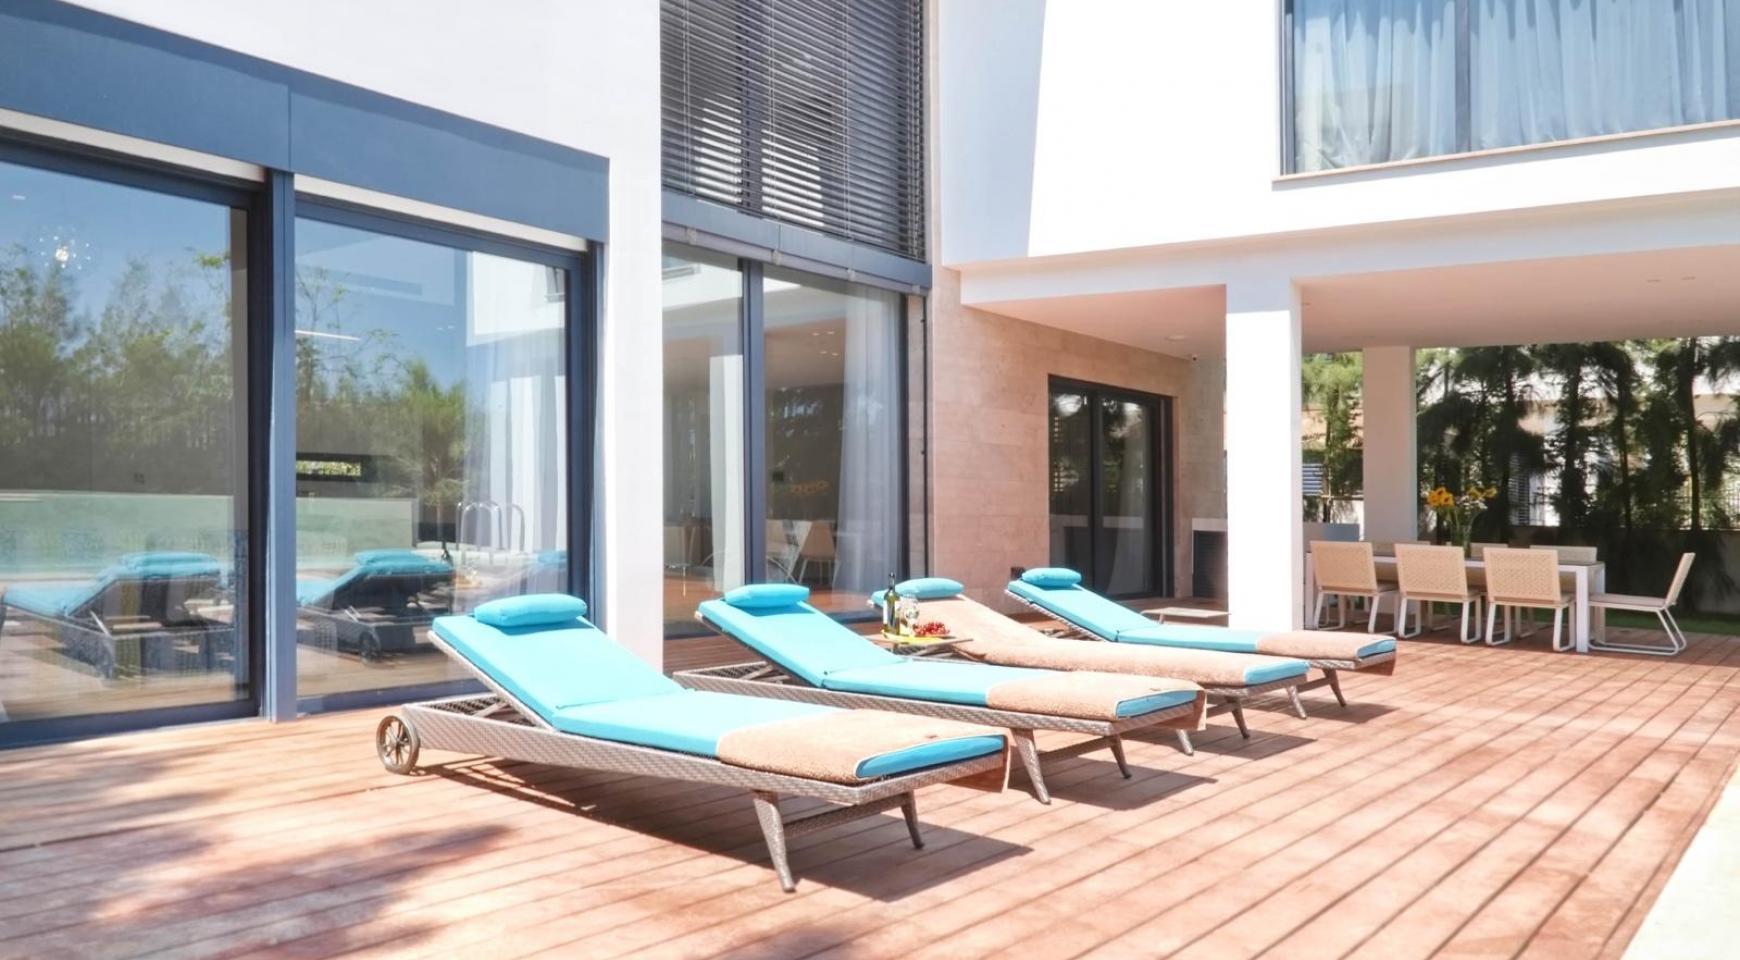 New Luxurious 4 Bedroom Villa in the Tourist Area - 3